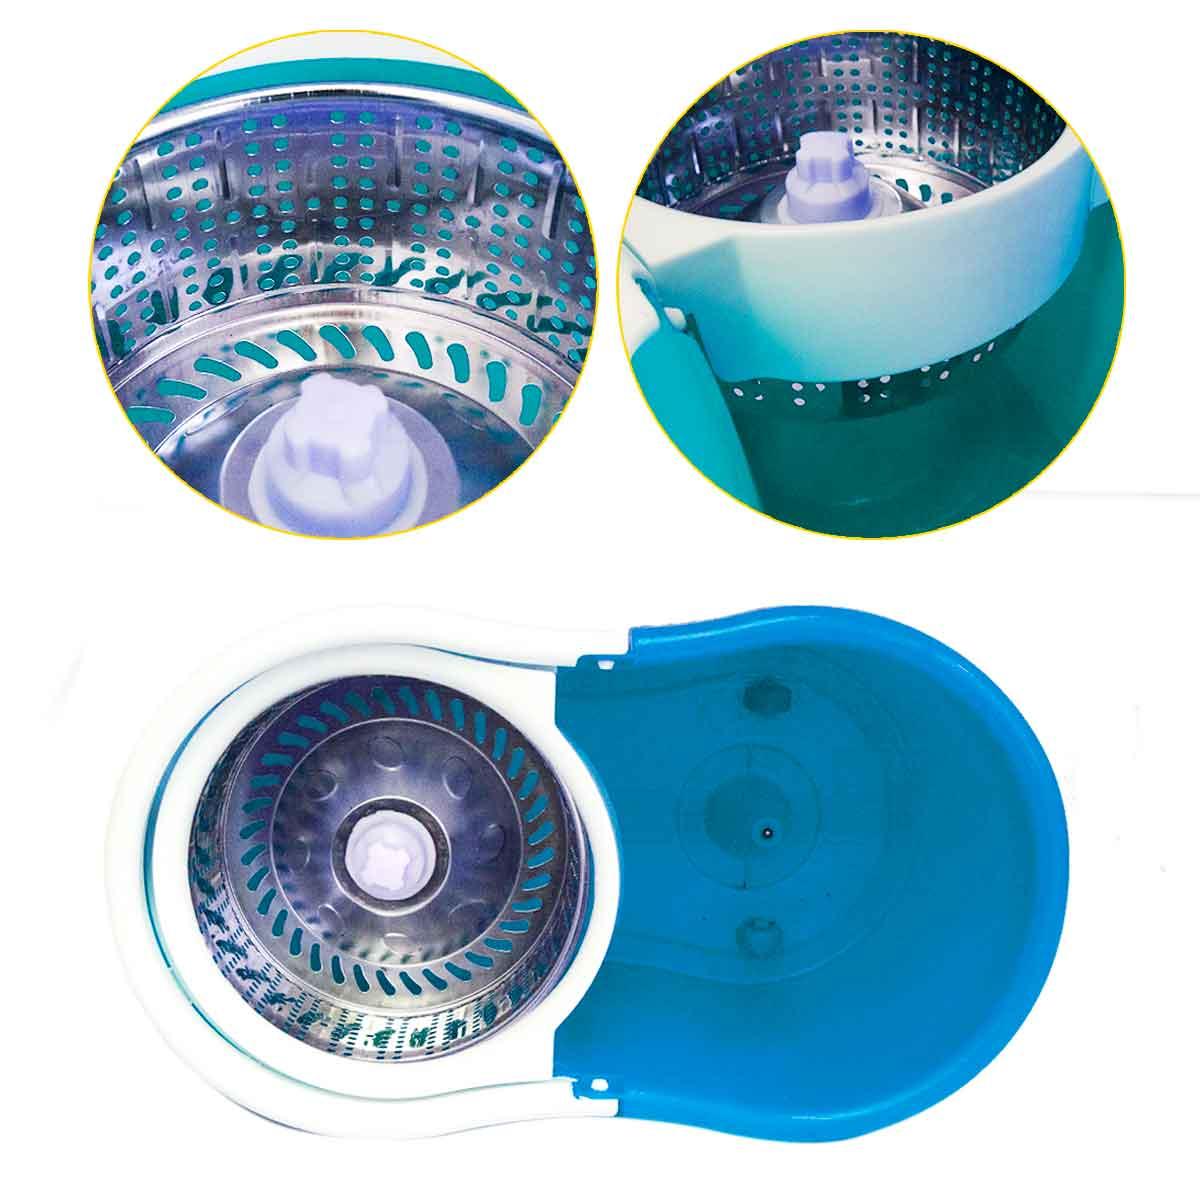 Kit 2 Balde Spin Mop 360 Centrifuga Inox 4 Refis Microfibra